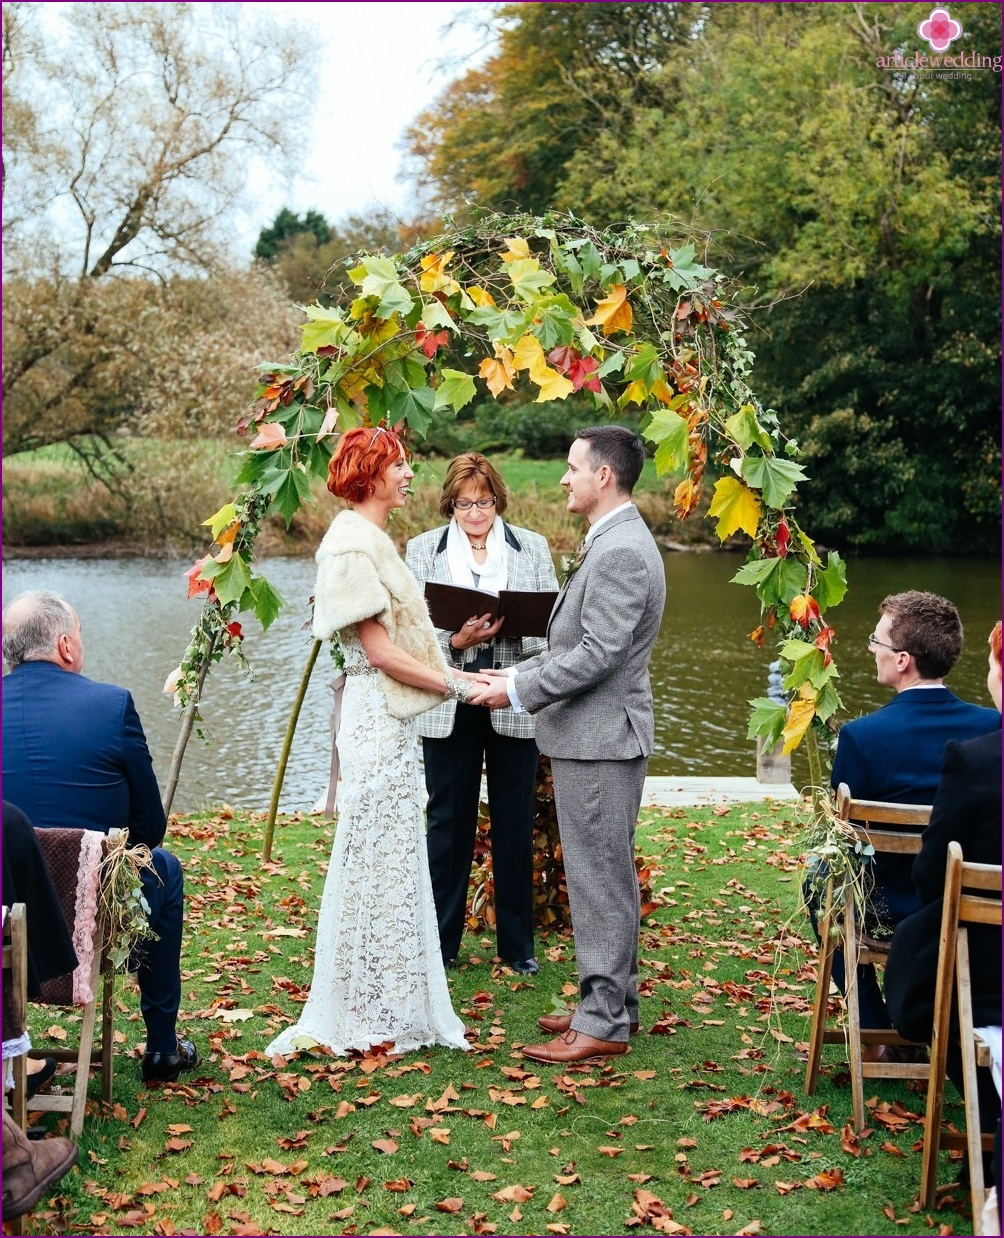 Wedding in eco-style